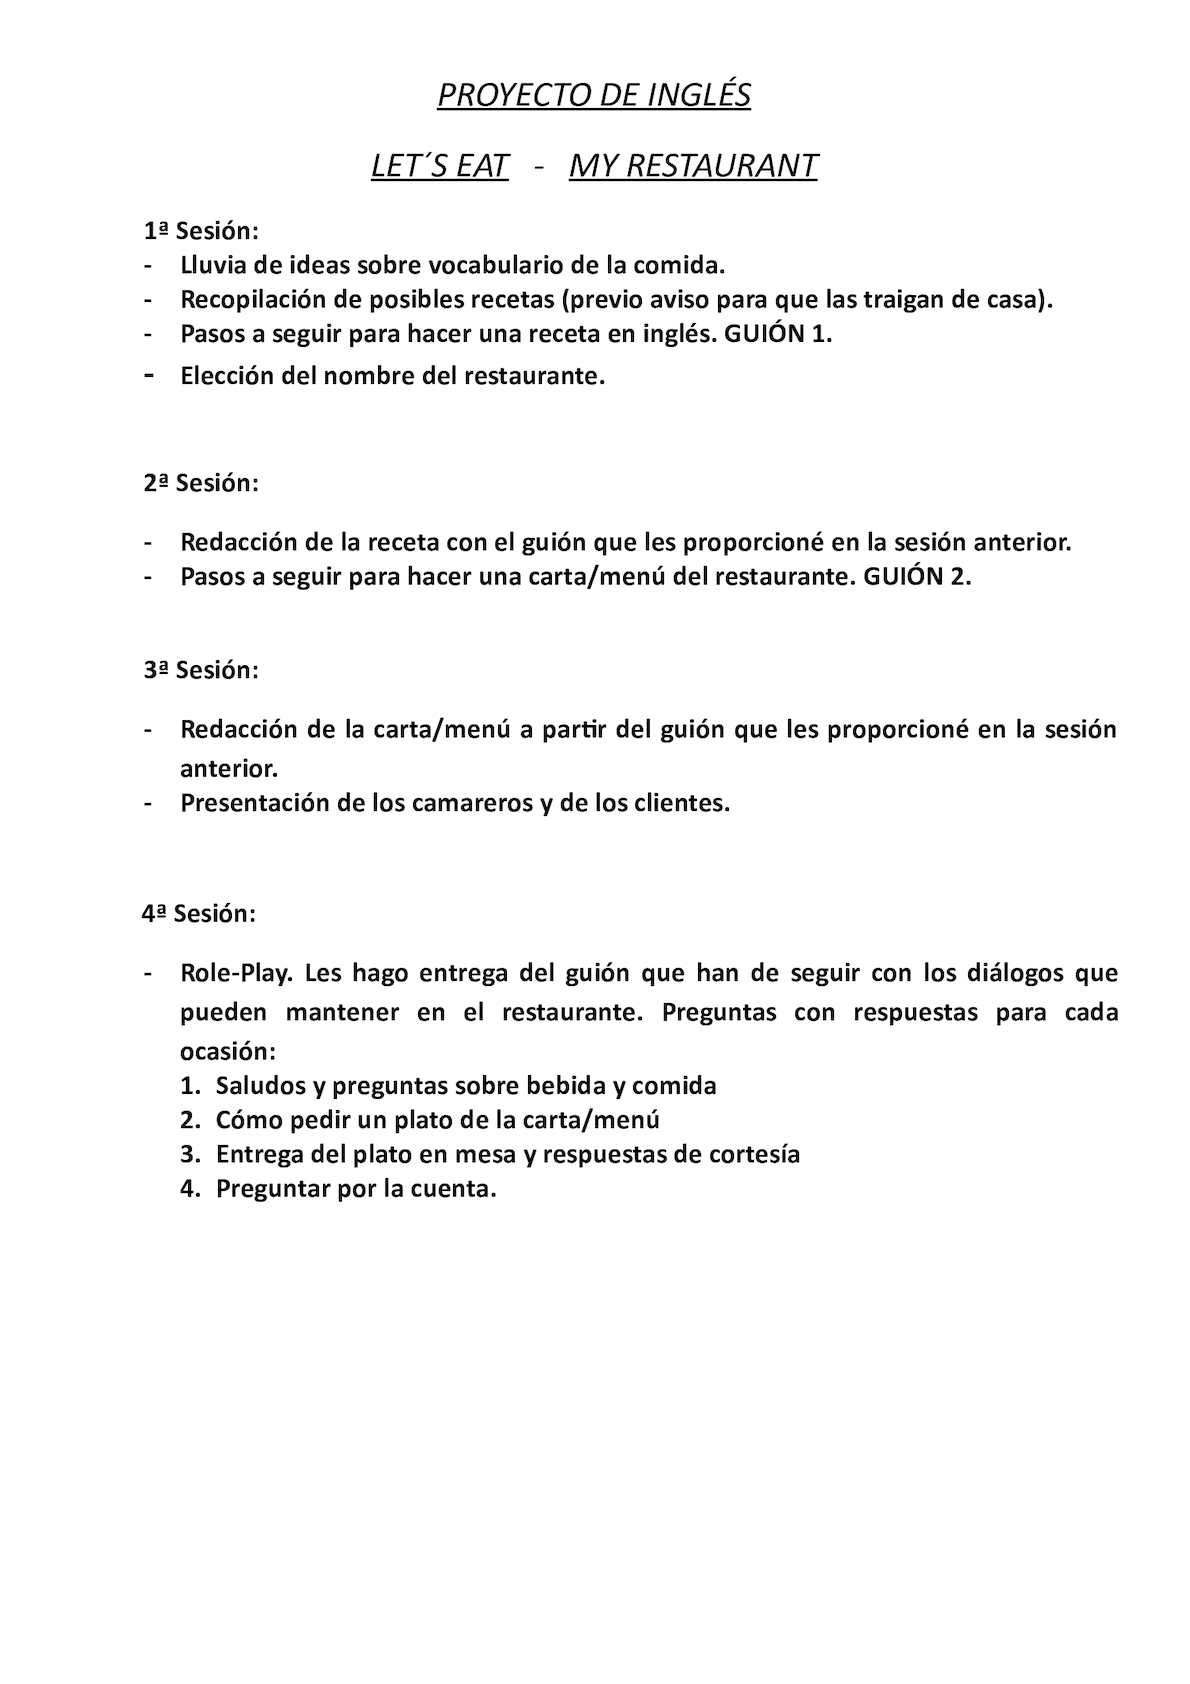 Calaméo - PROYECTO DE INGLÉS 06b6b8cb1f07